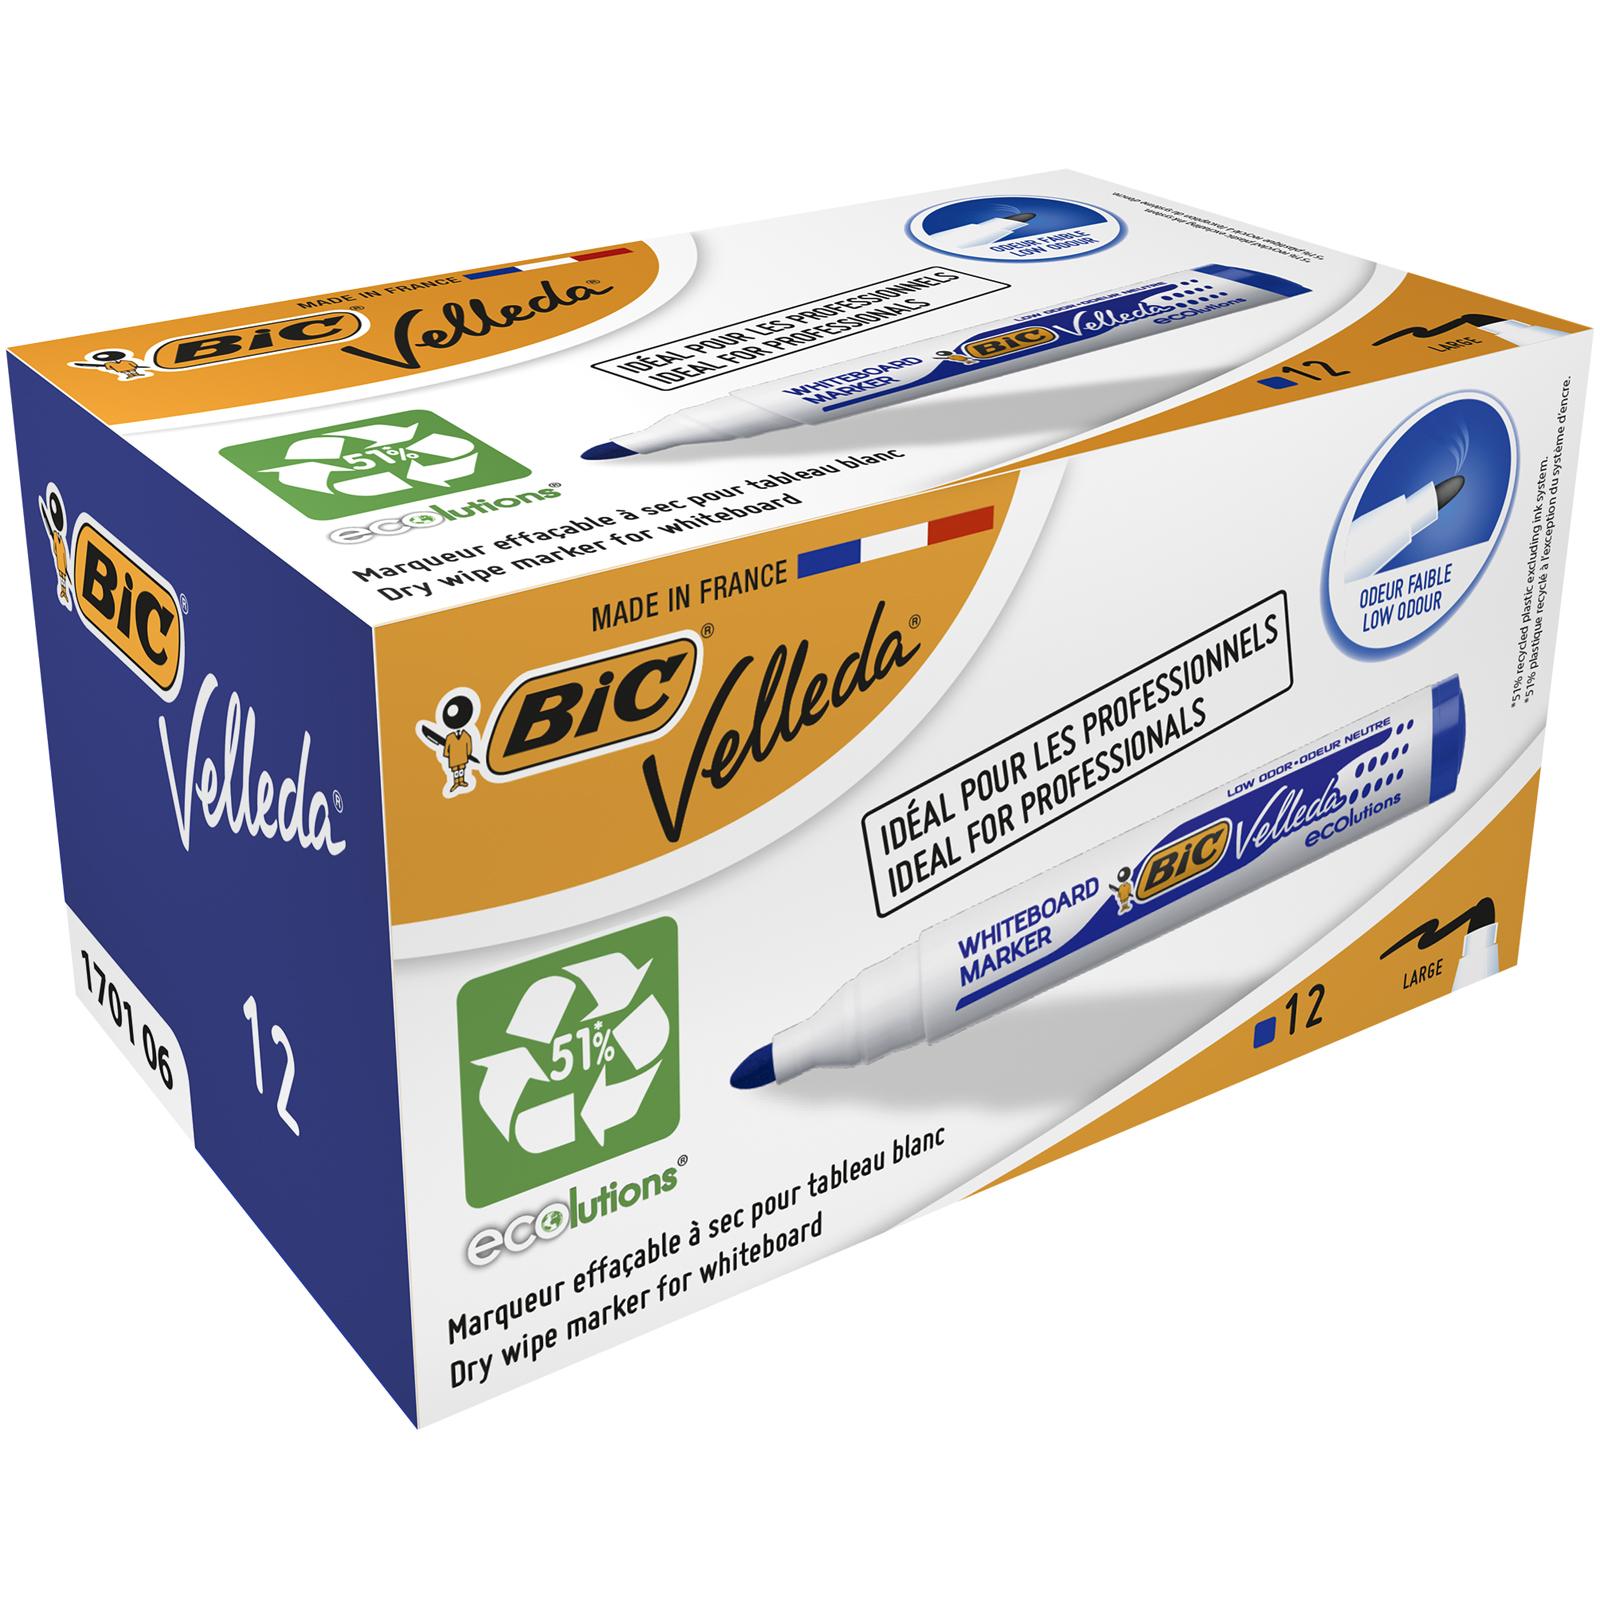 BIC VELLEDA 1701 - Pack de 12 - Marqueurs effaçables - pointe ogive - bleu